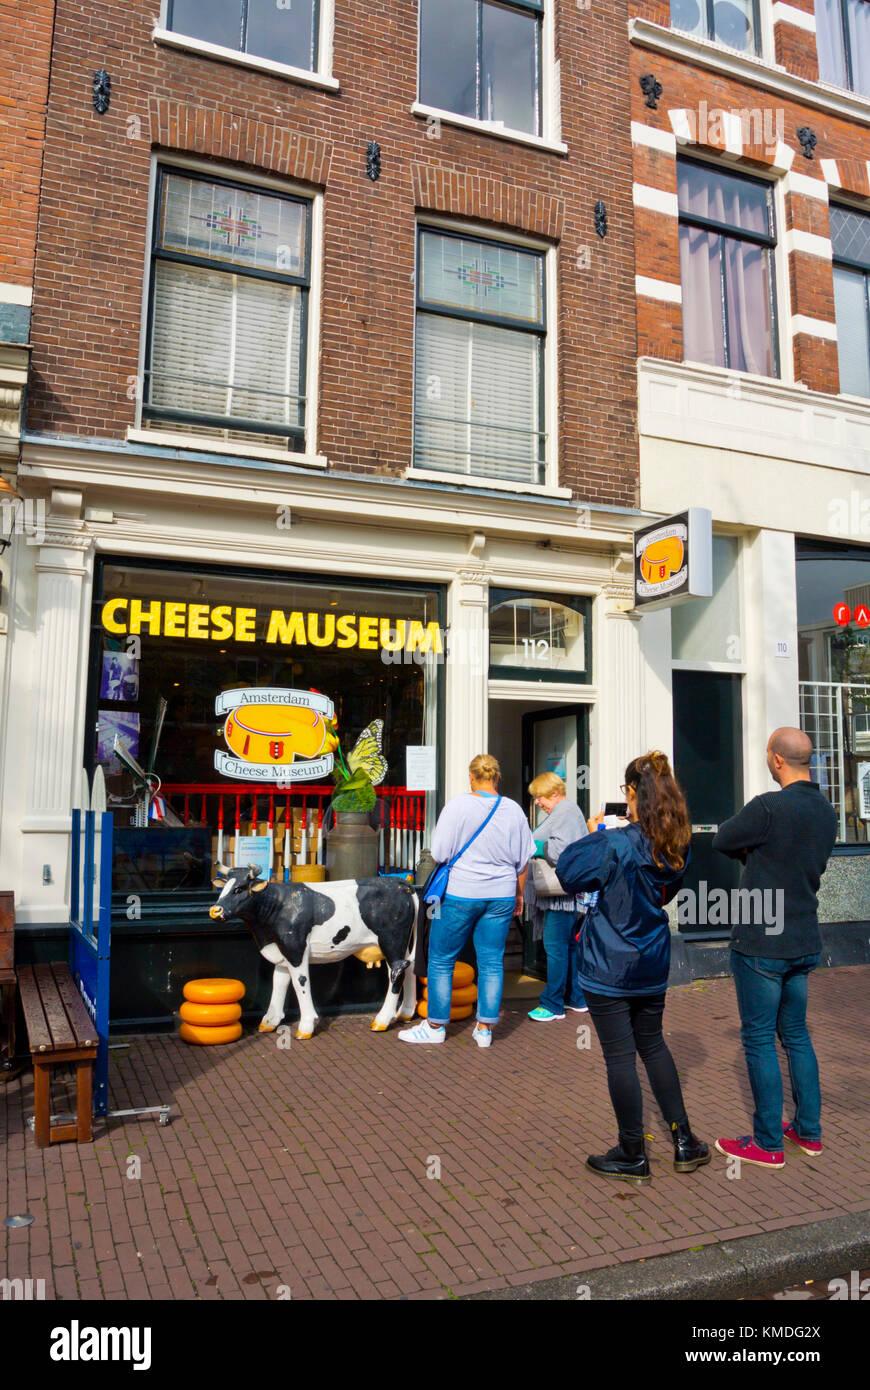 Cheese museum, Prinsengracht, Jordaan, Amsterdam, The Netherlands - Stock Image